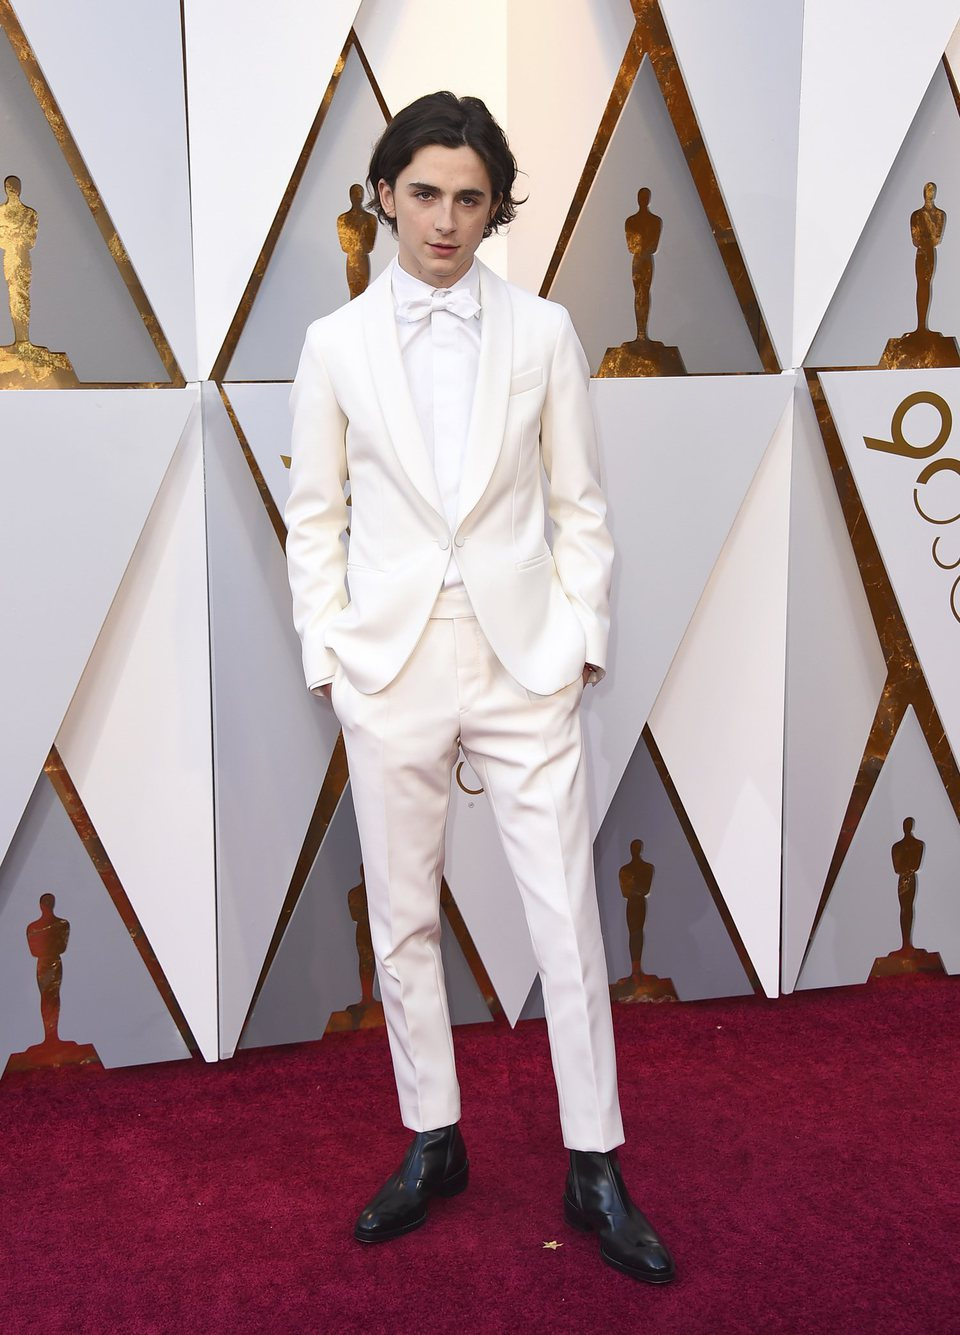 Timothée Chalamet en la alfombra roja de los Oscar 2018